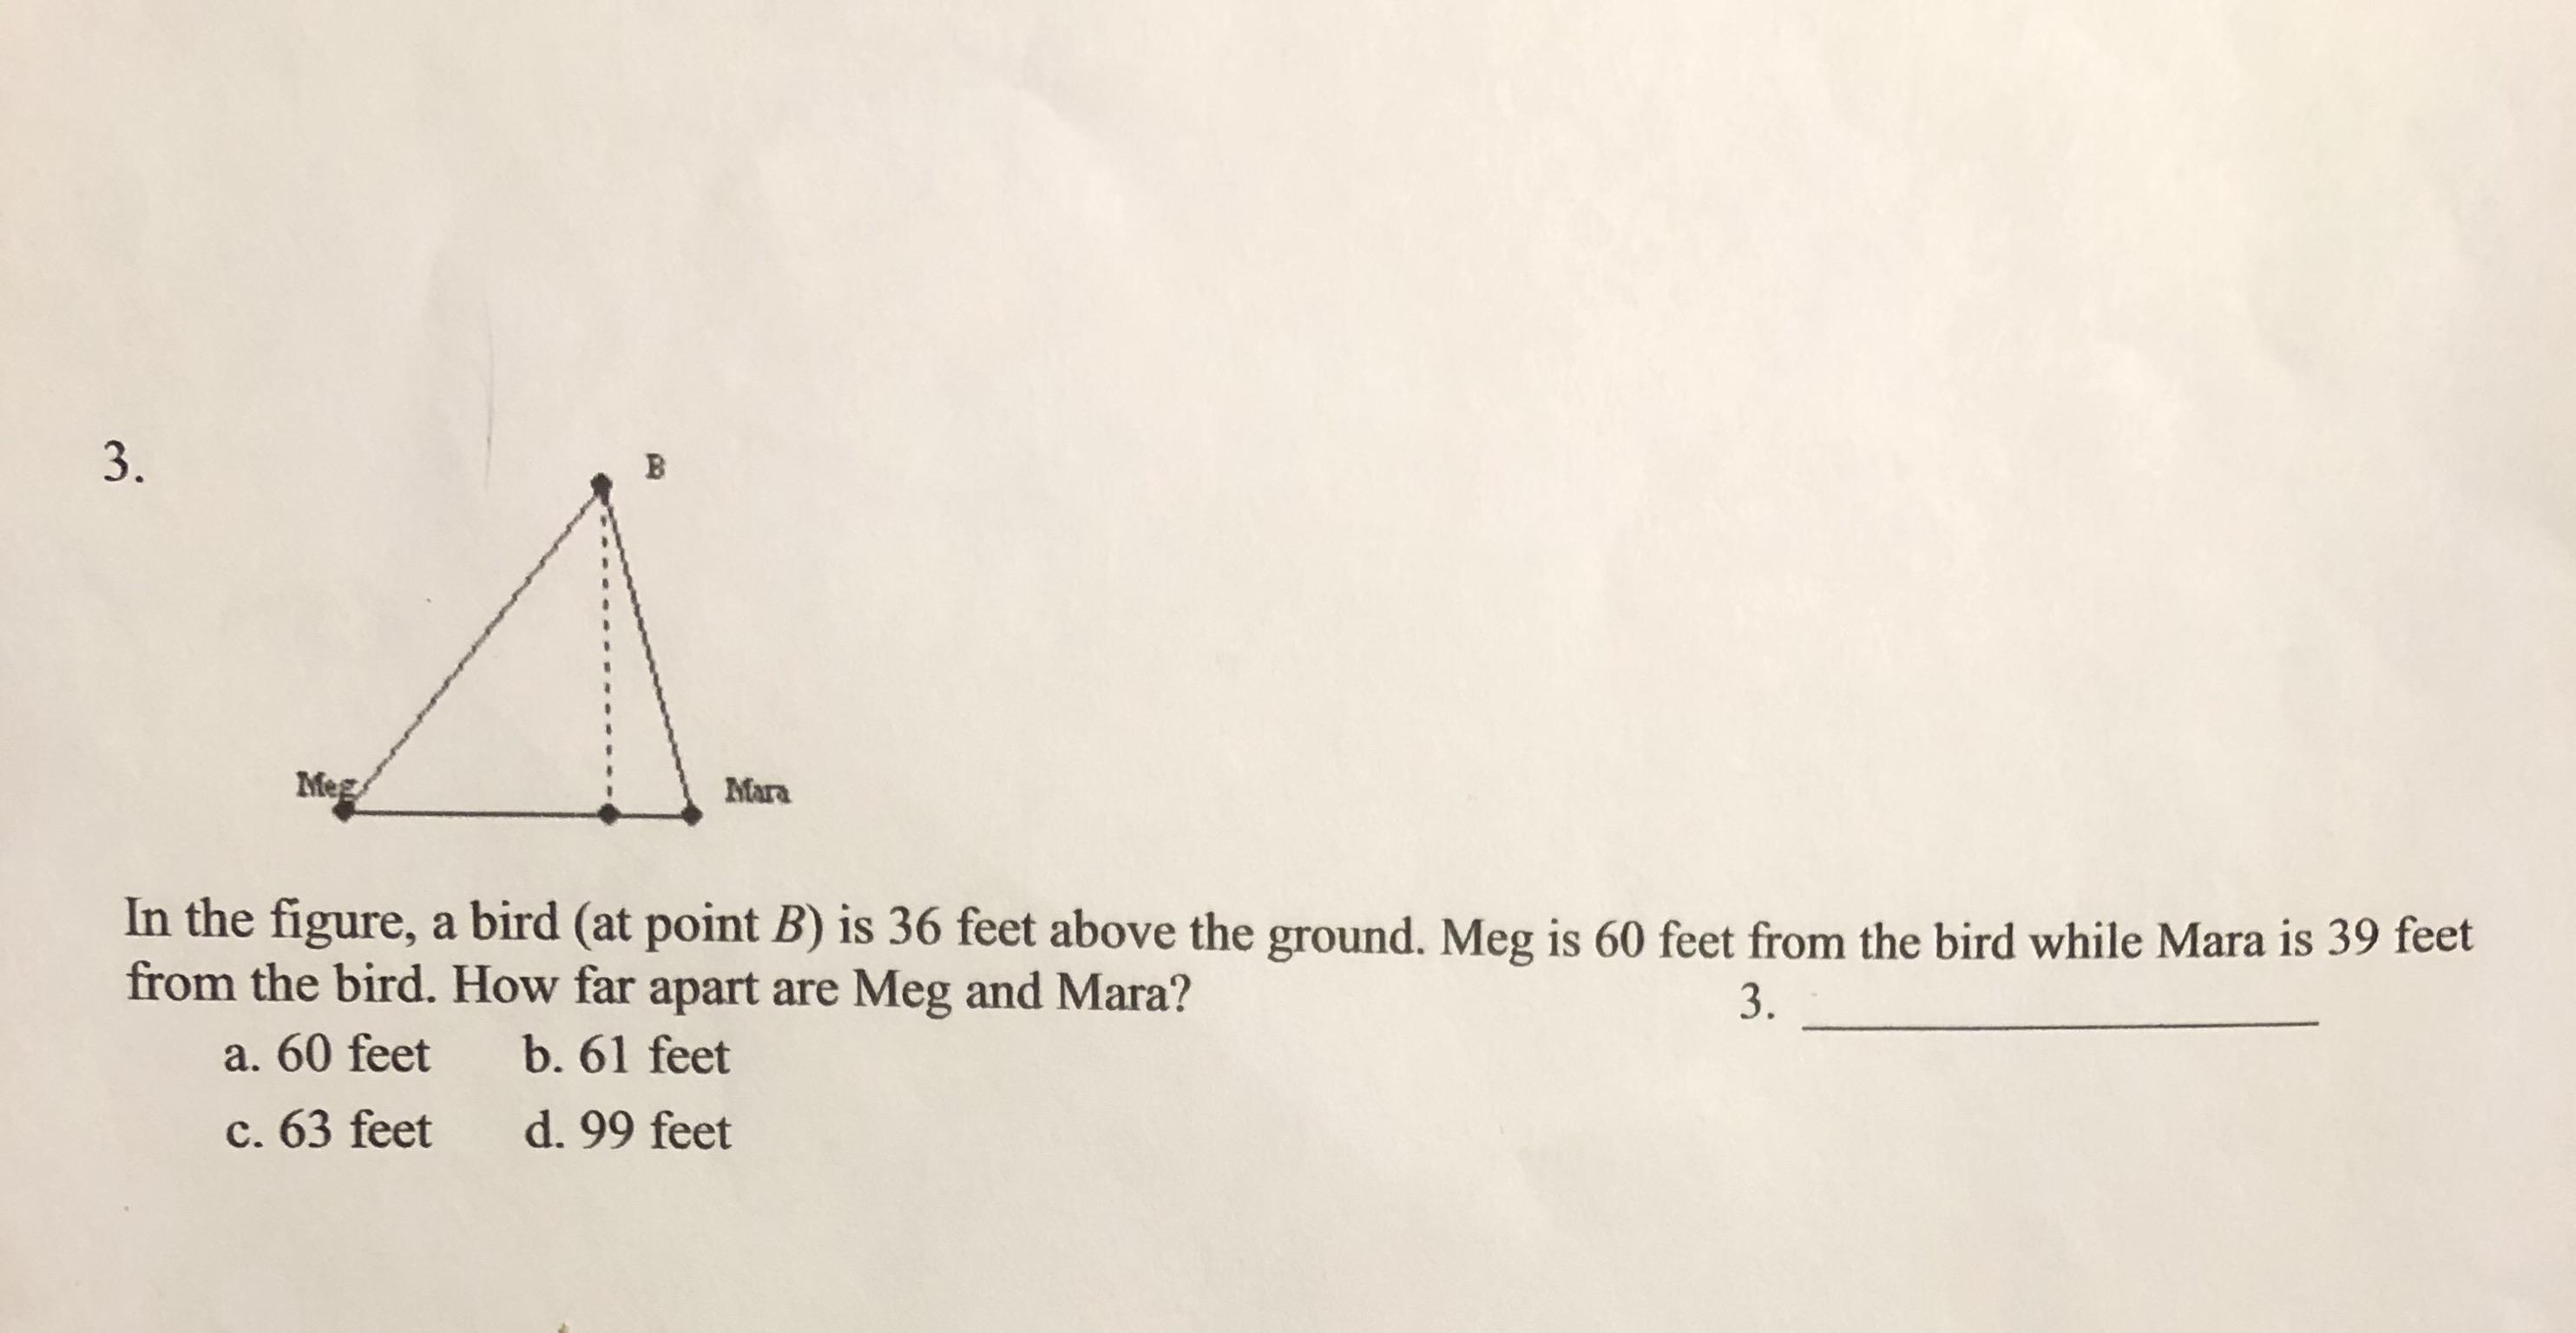 3. Meg Mara In the figure, a bird (at point B) is 36 feet above the ground. Meg is 60 feet from the bird while Mara is 39 feet from the bird. How far apart are Meg and Mara? 3. b. 61 feet a. 60 feet d. 99 feet c. 63 feet B